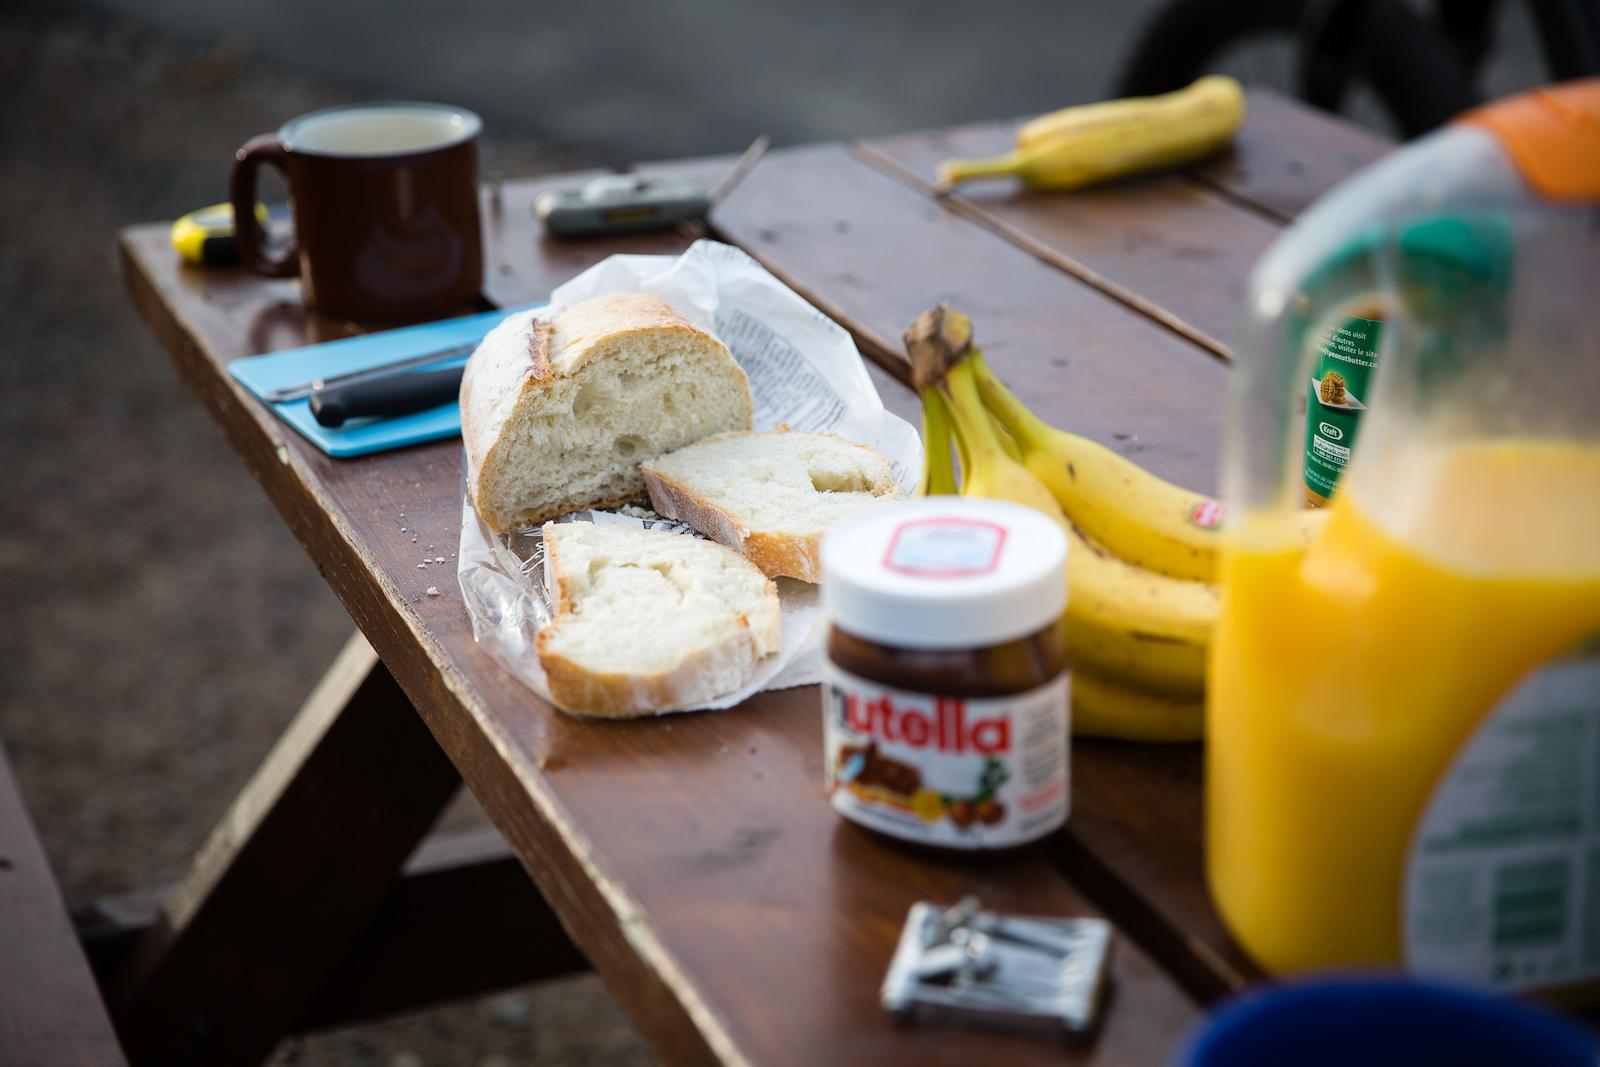 Breakfast of champions. PHOTO Ben Gavelda